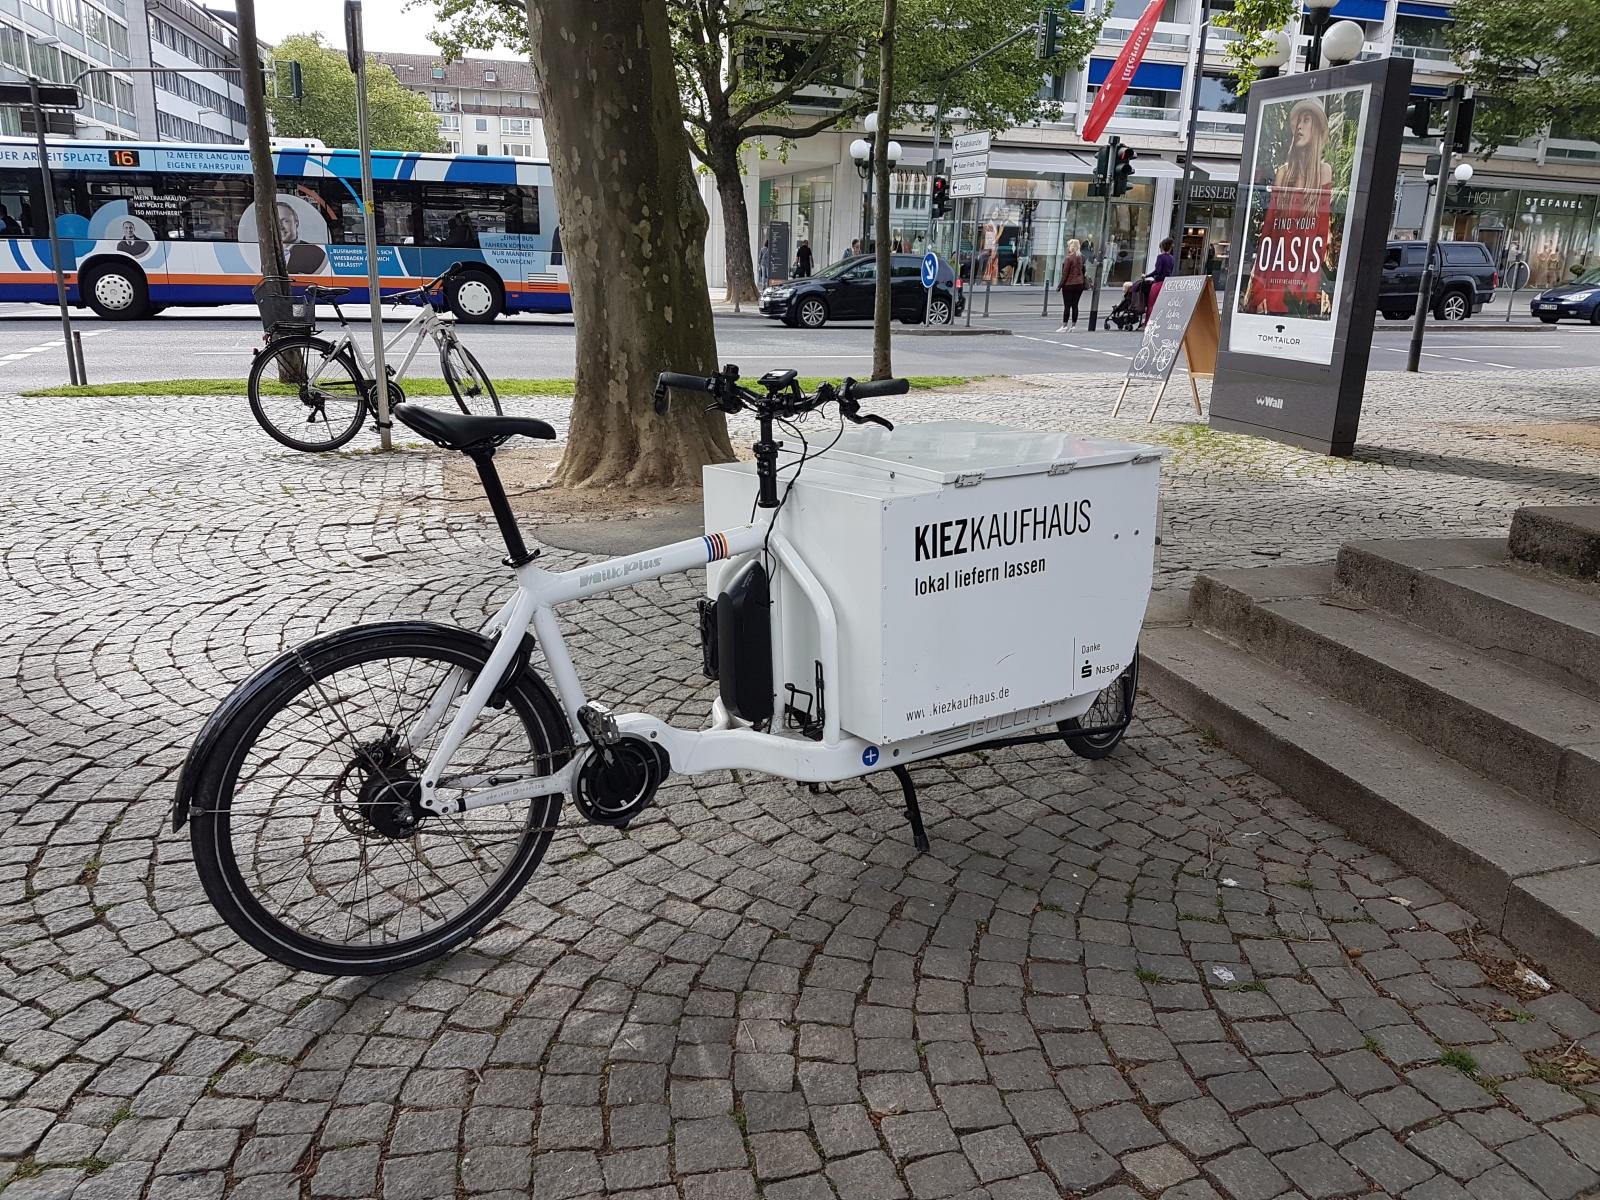 Kiezkaufhaus Lastenrad Wiesbaden regionale Produkte